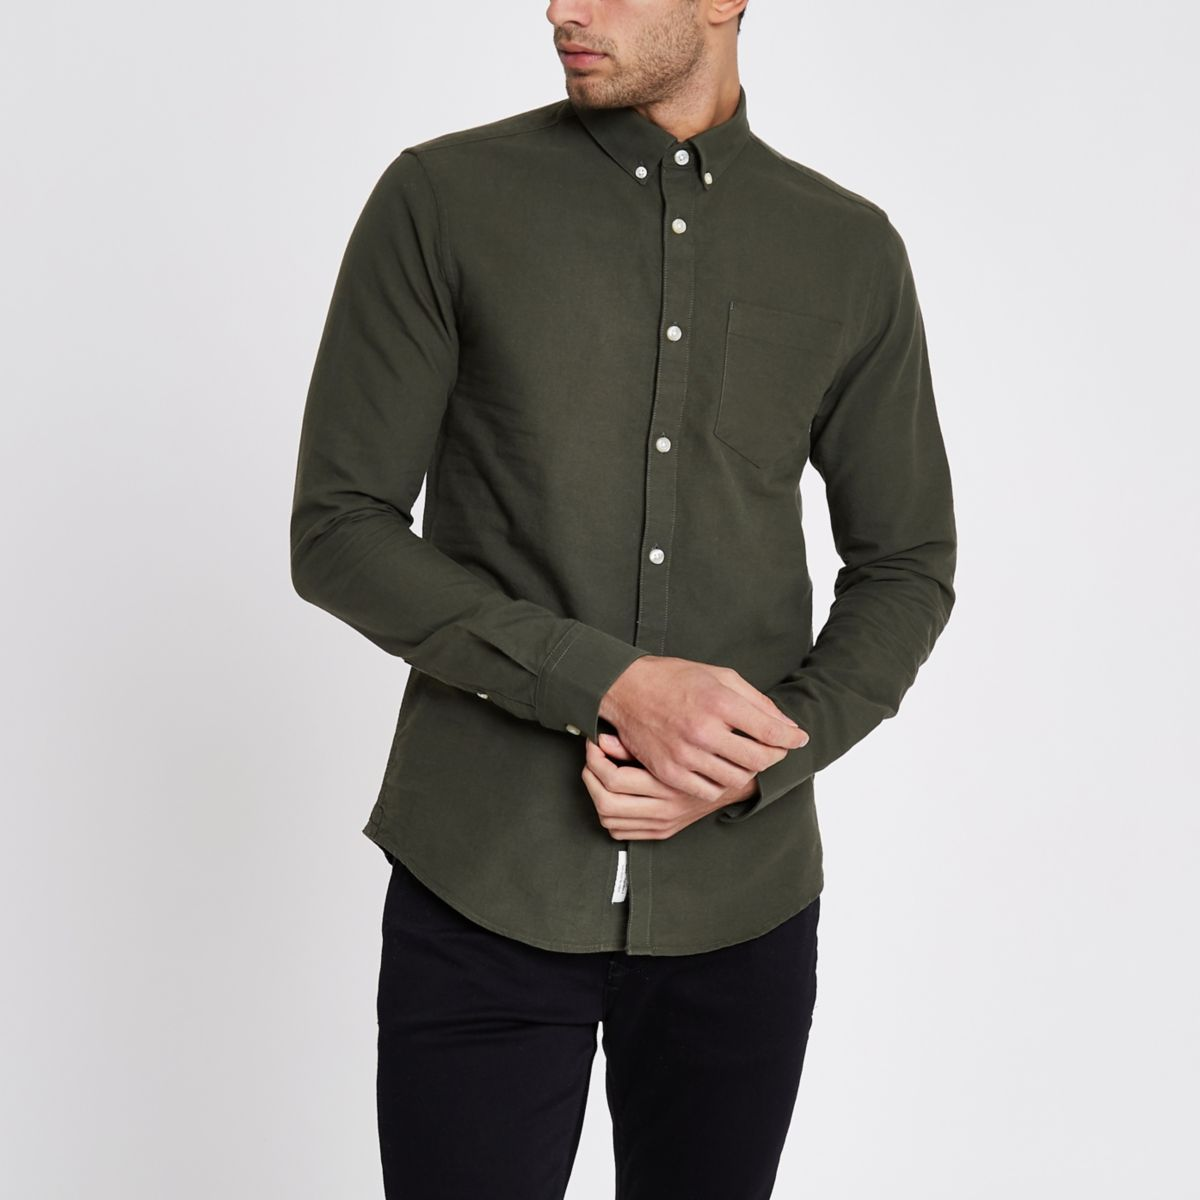 Green long sleeve button-down Oxford shirt